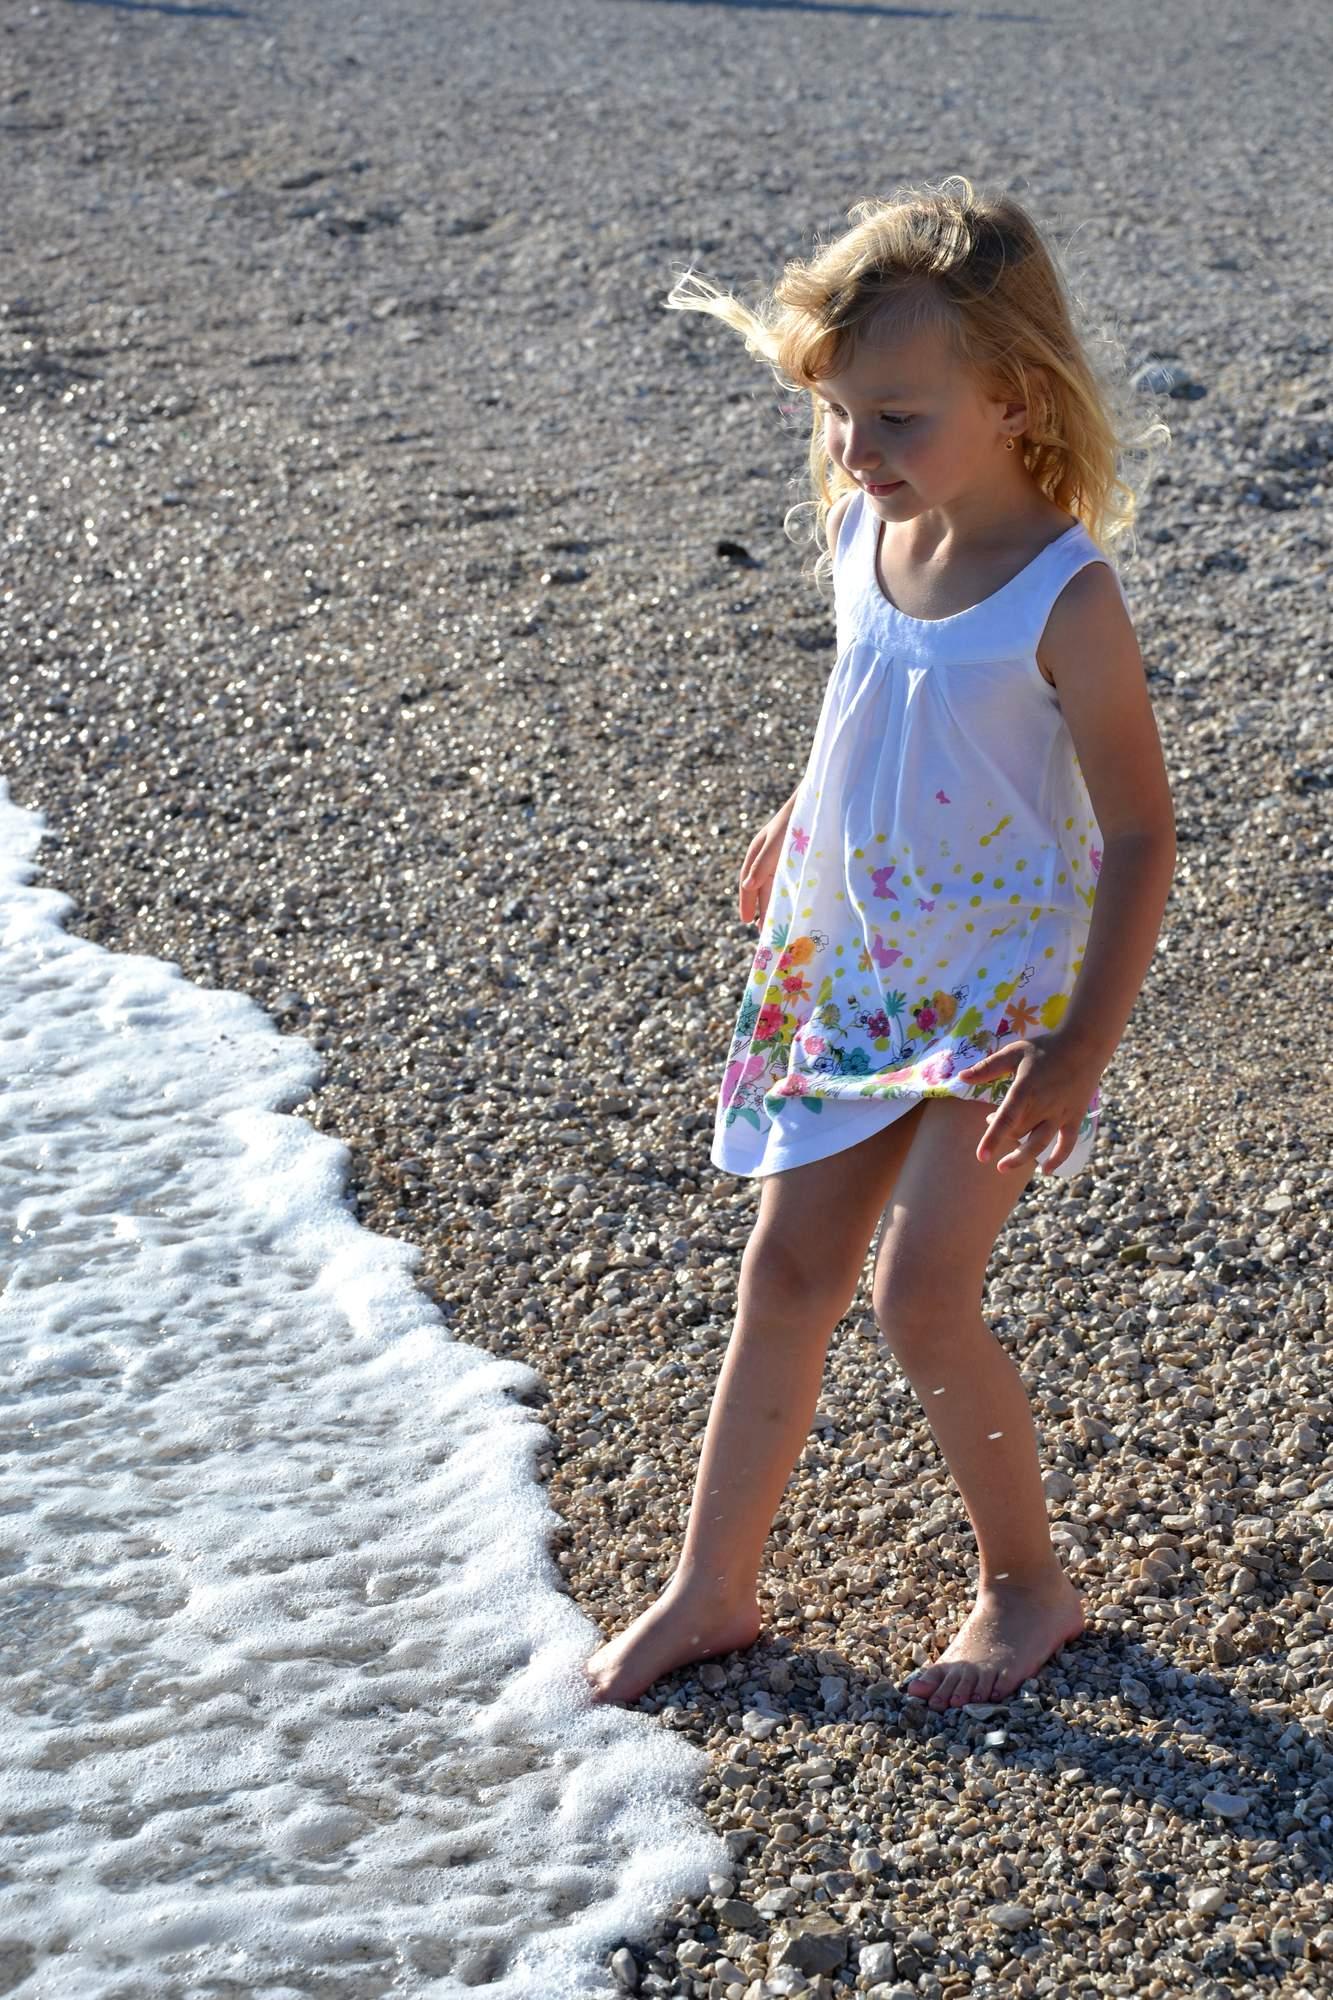 rajce.idnes.cs2010little petite nude